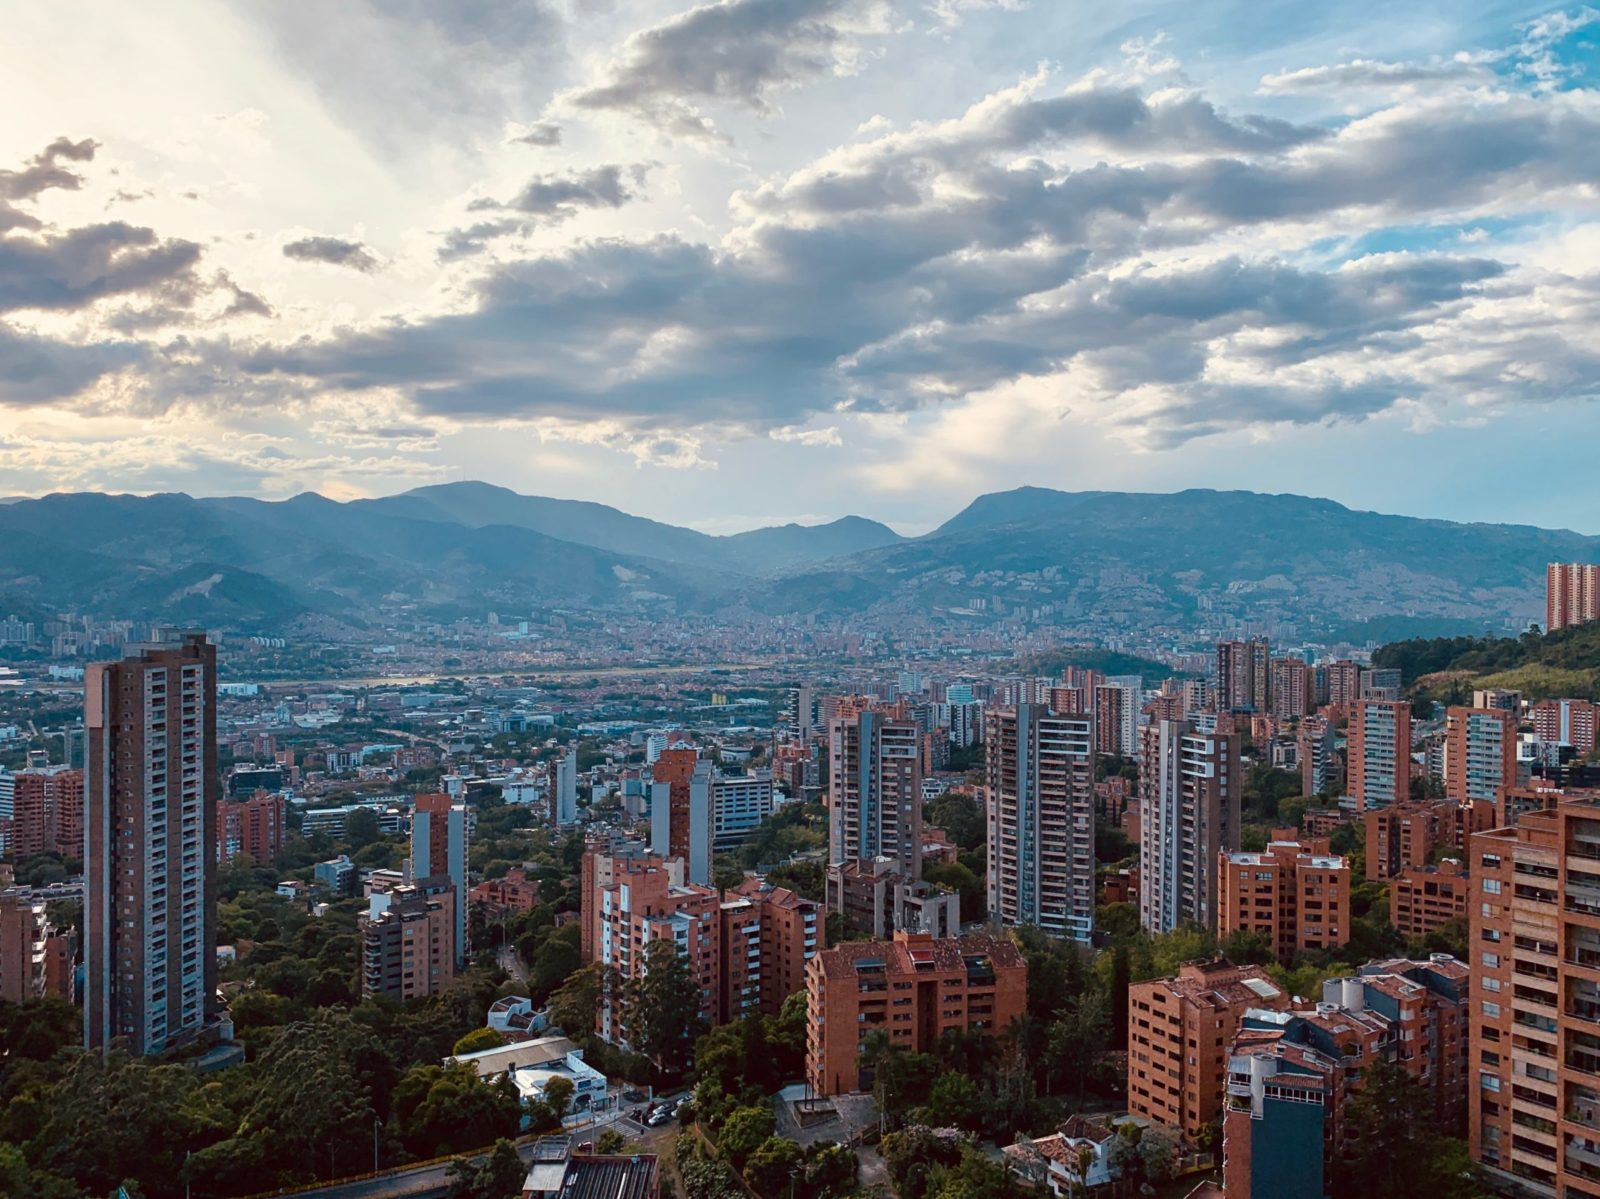 ISTO Americas in Medellin, Colombia